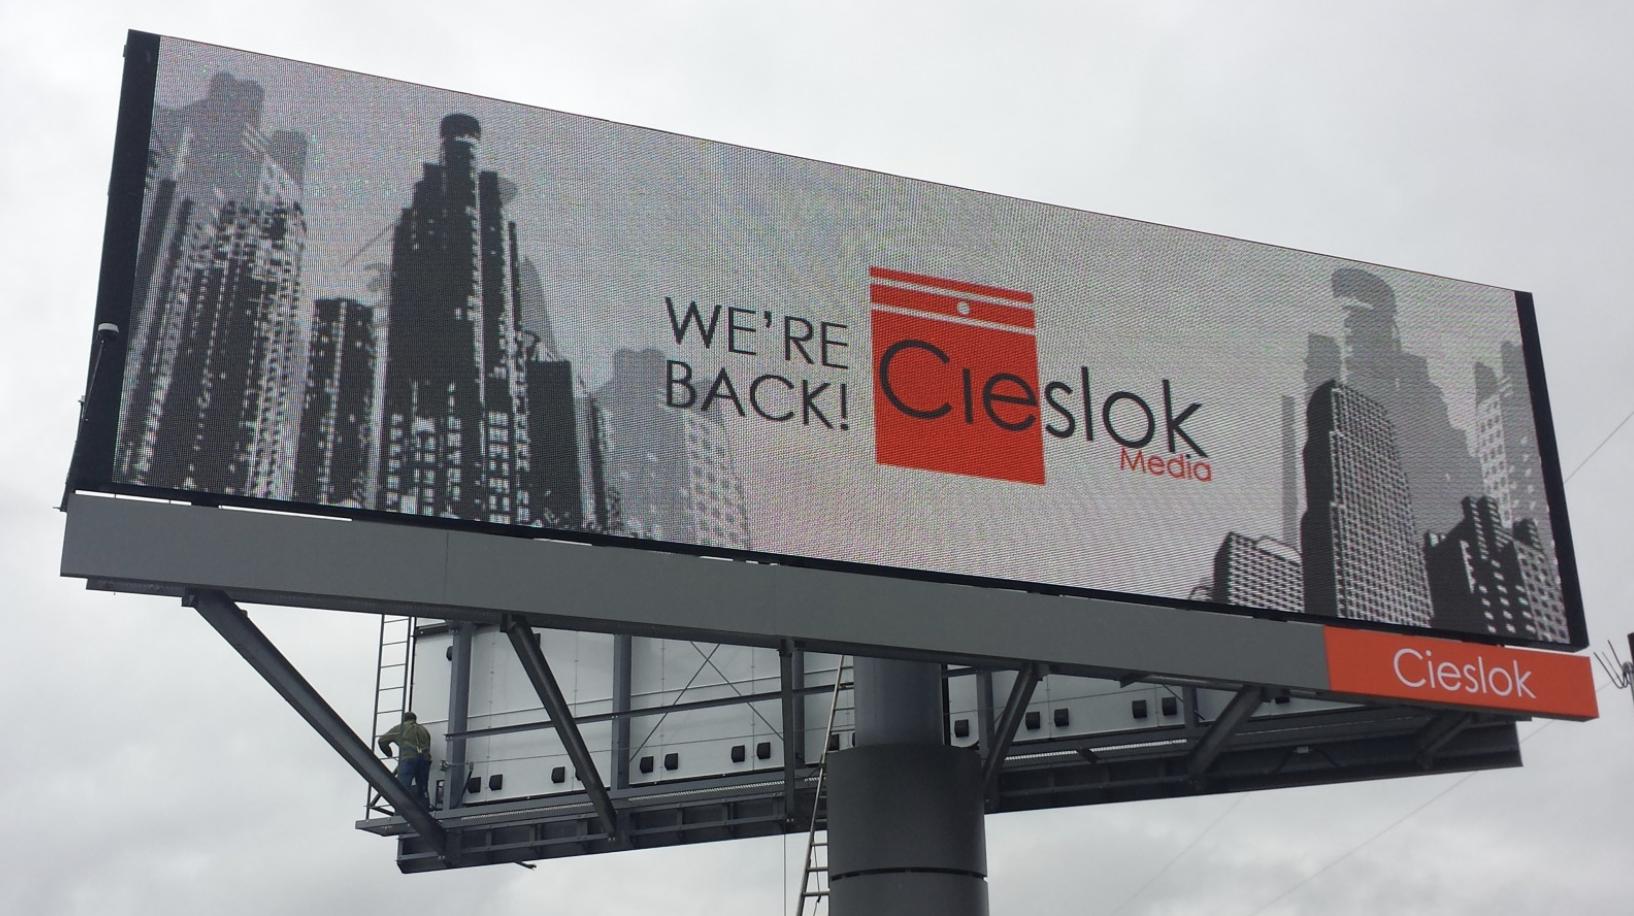 a digital billboard owned by Cieslok Medi